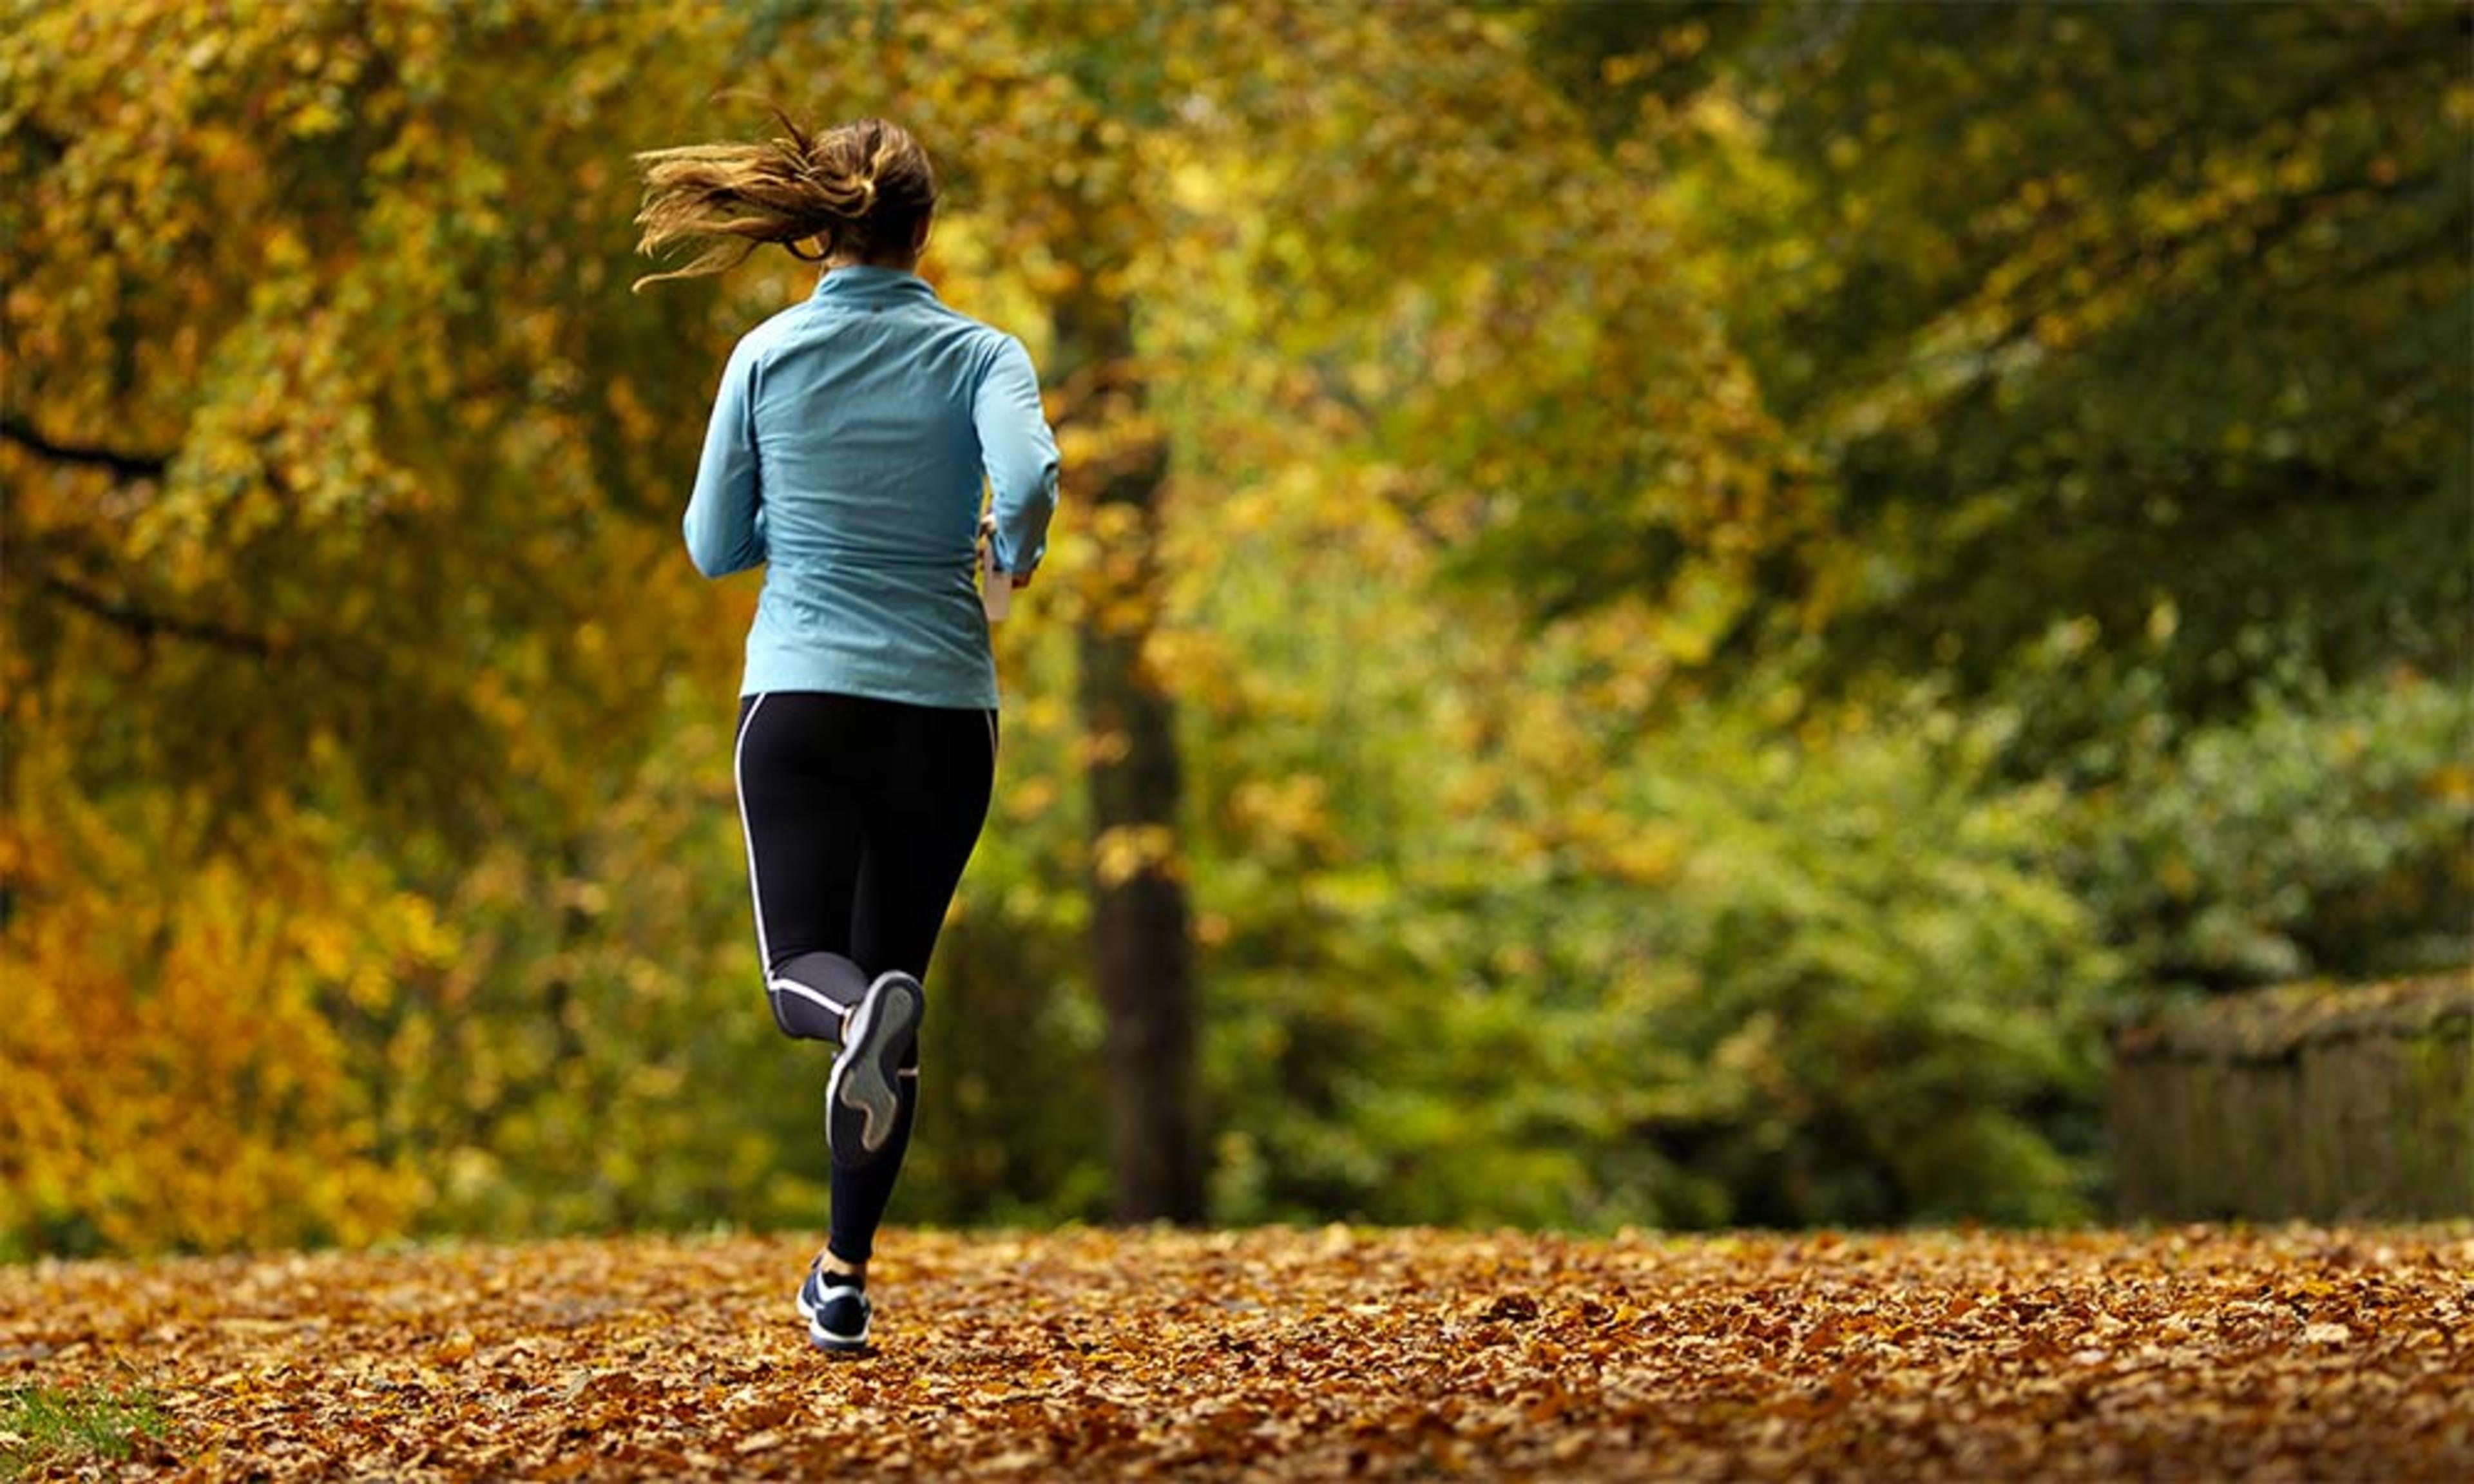 Woman jogging through a leafy park